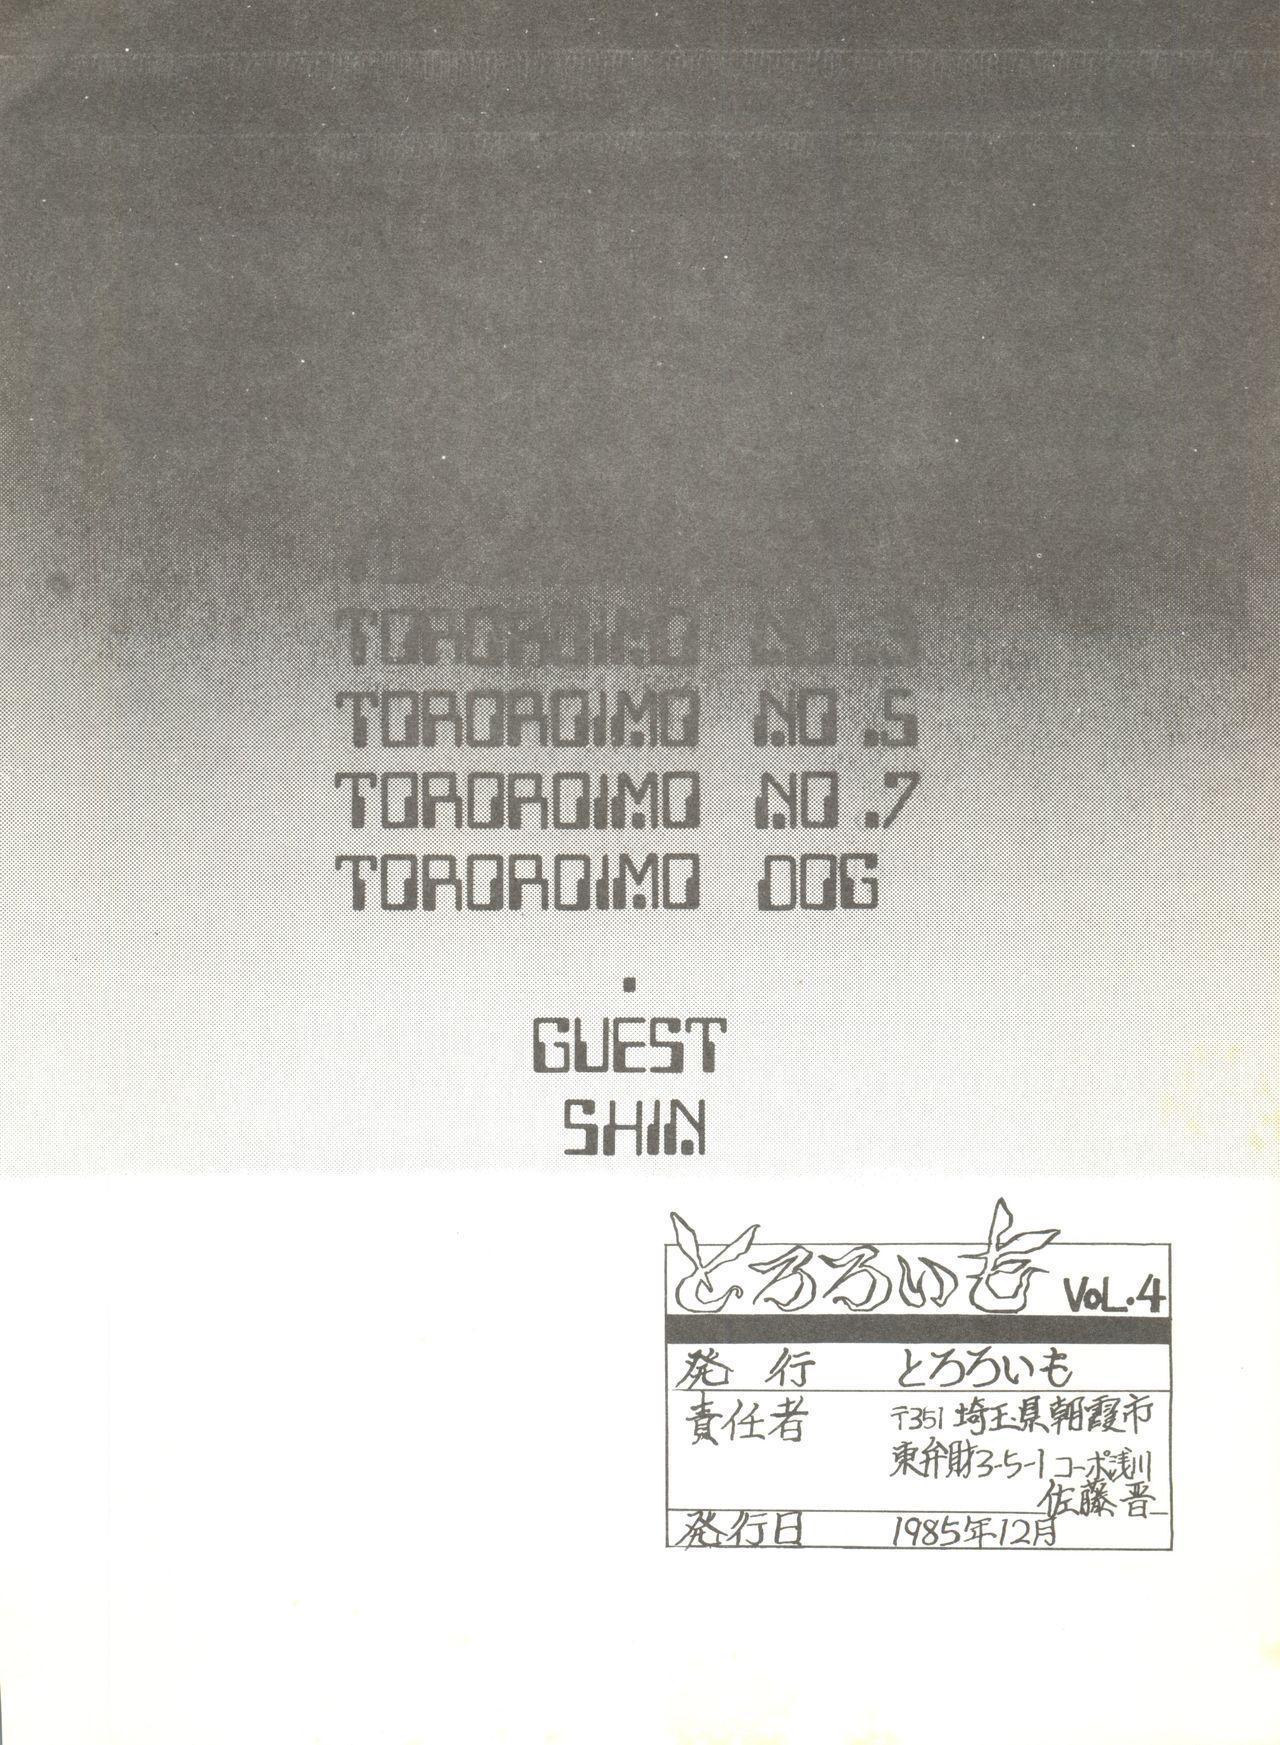 Tororoimo Vol. 4 97